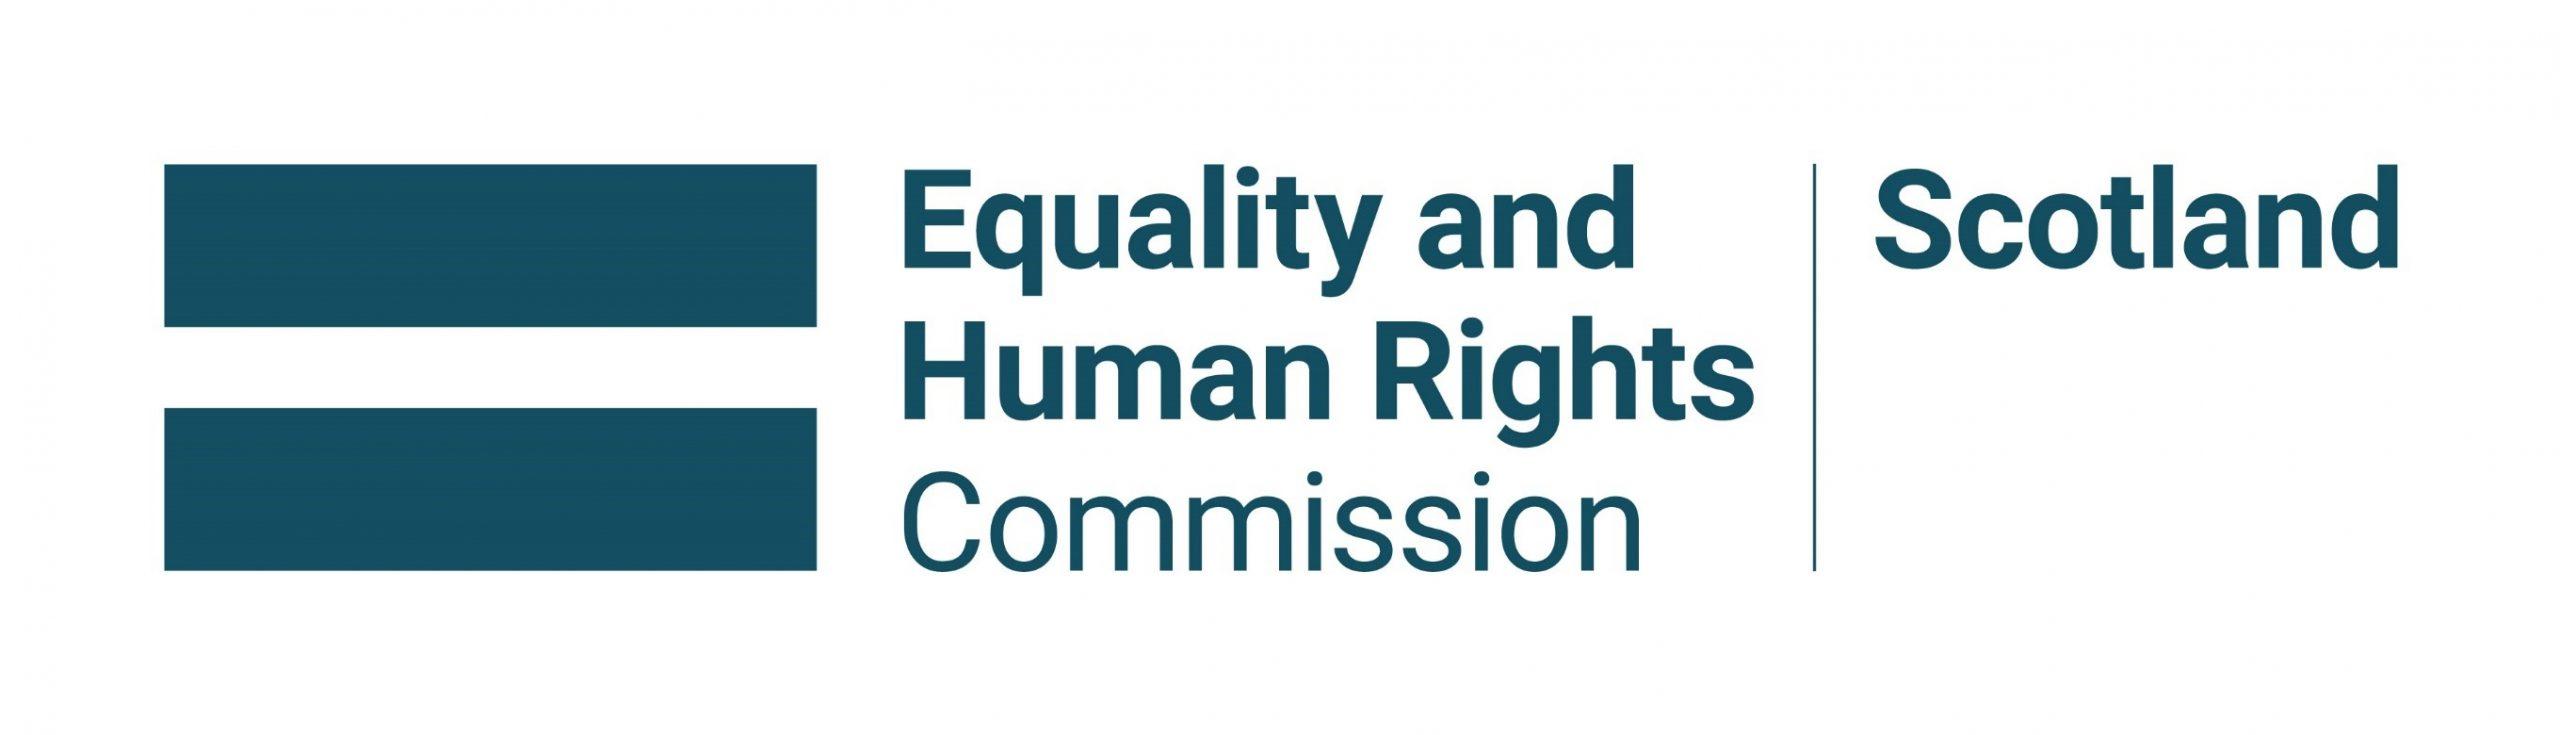 EHRC Scotland logo